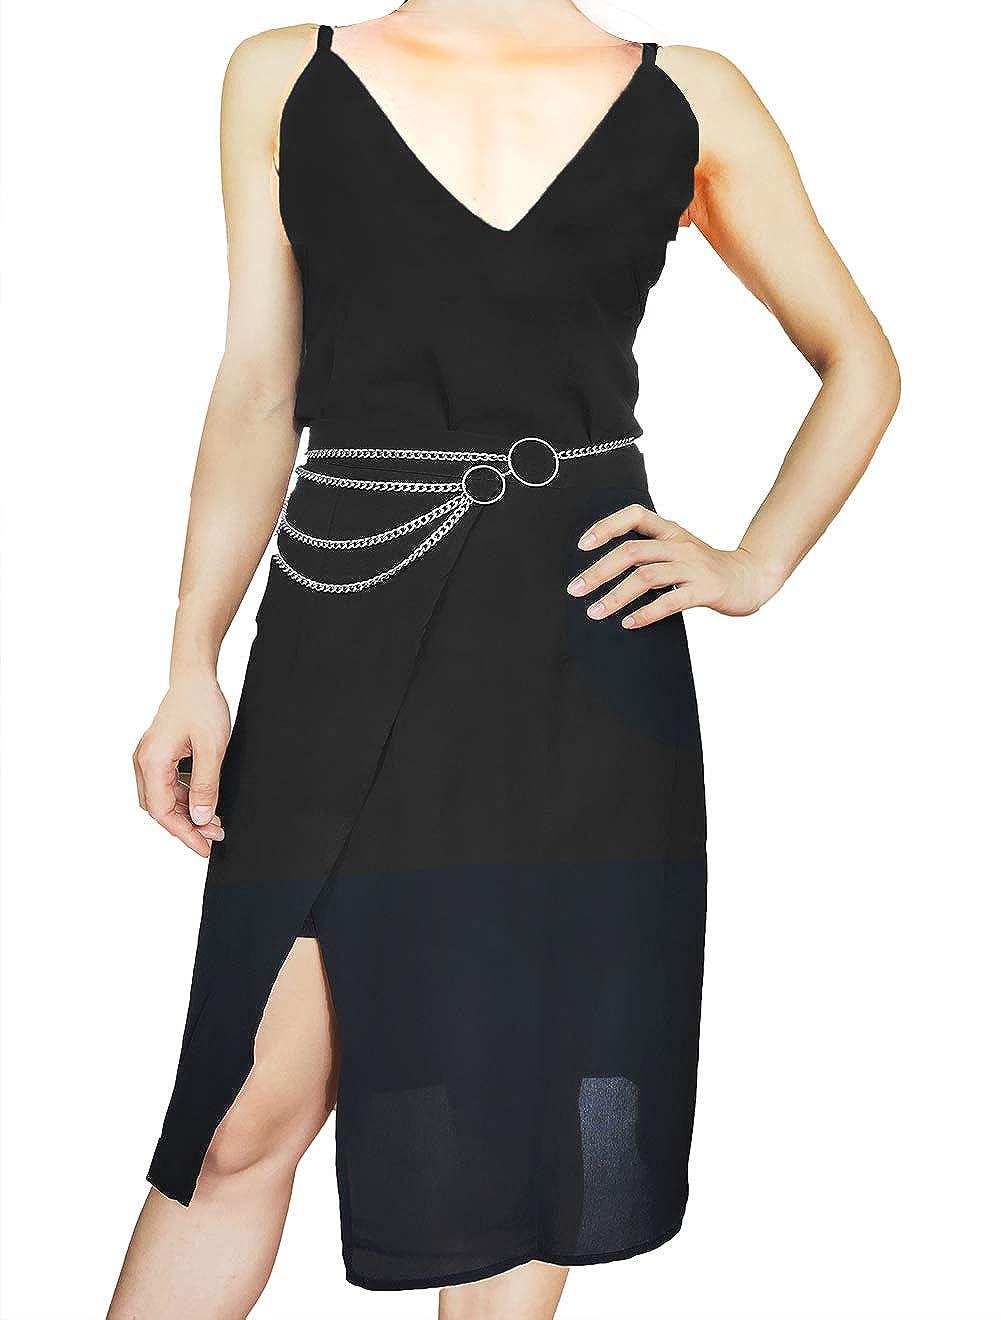 Eyraevor Women Long Tassel Waist Chain Belt Multilayer Body Belly Chain for Dress